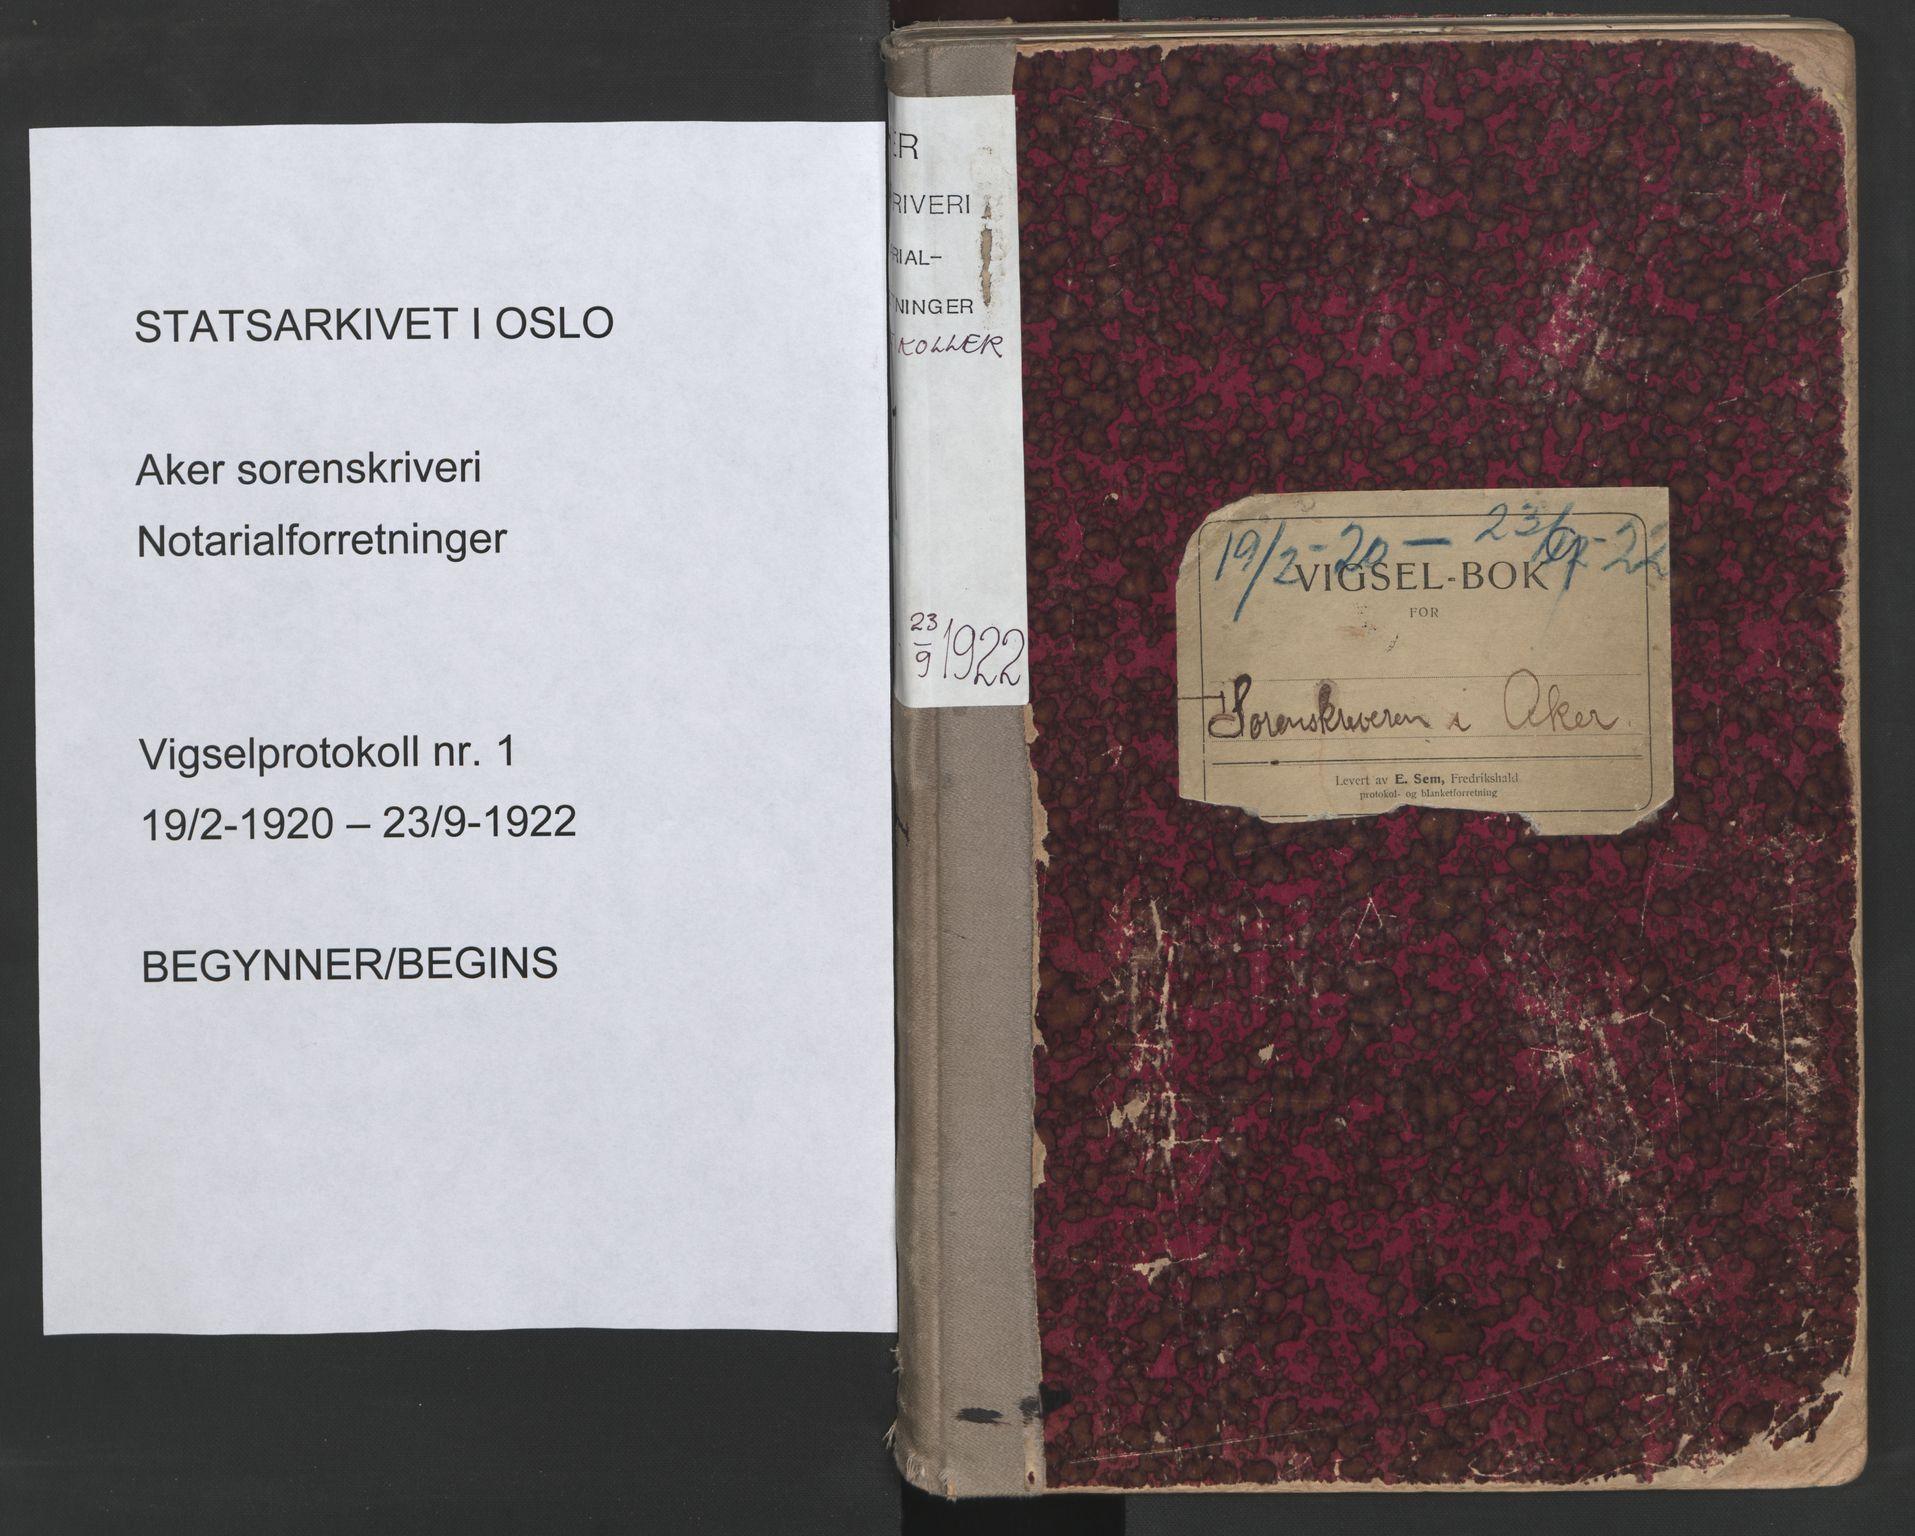 SAO, Aker sorenskriveri, L/Lc/Lcb/L0001: Vigselprotokoll, 1920-1922, s. upaginert